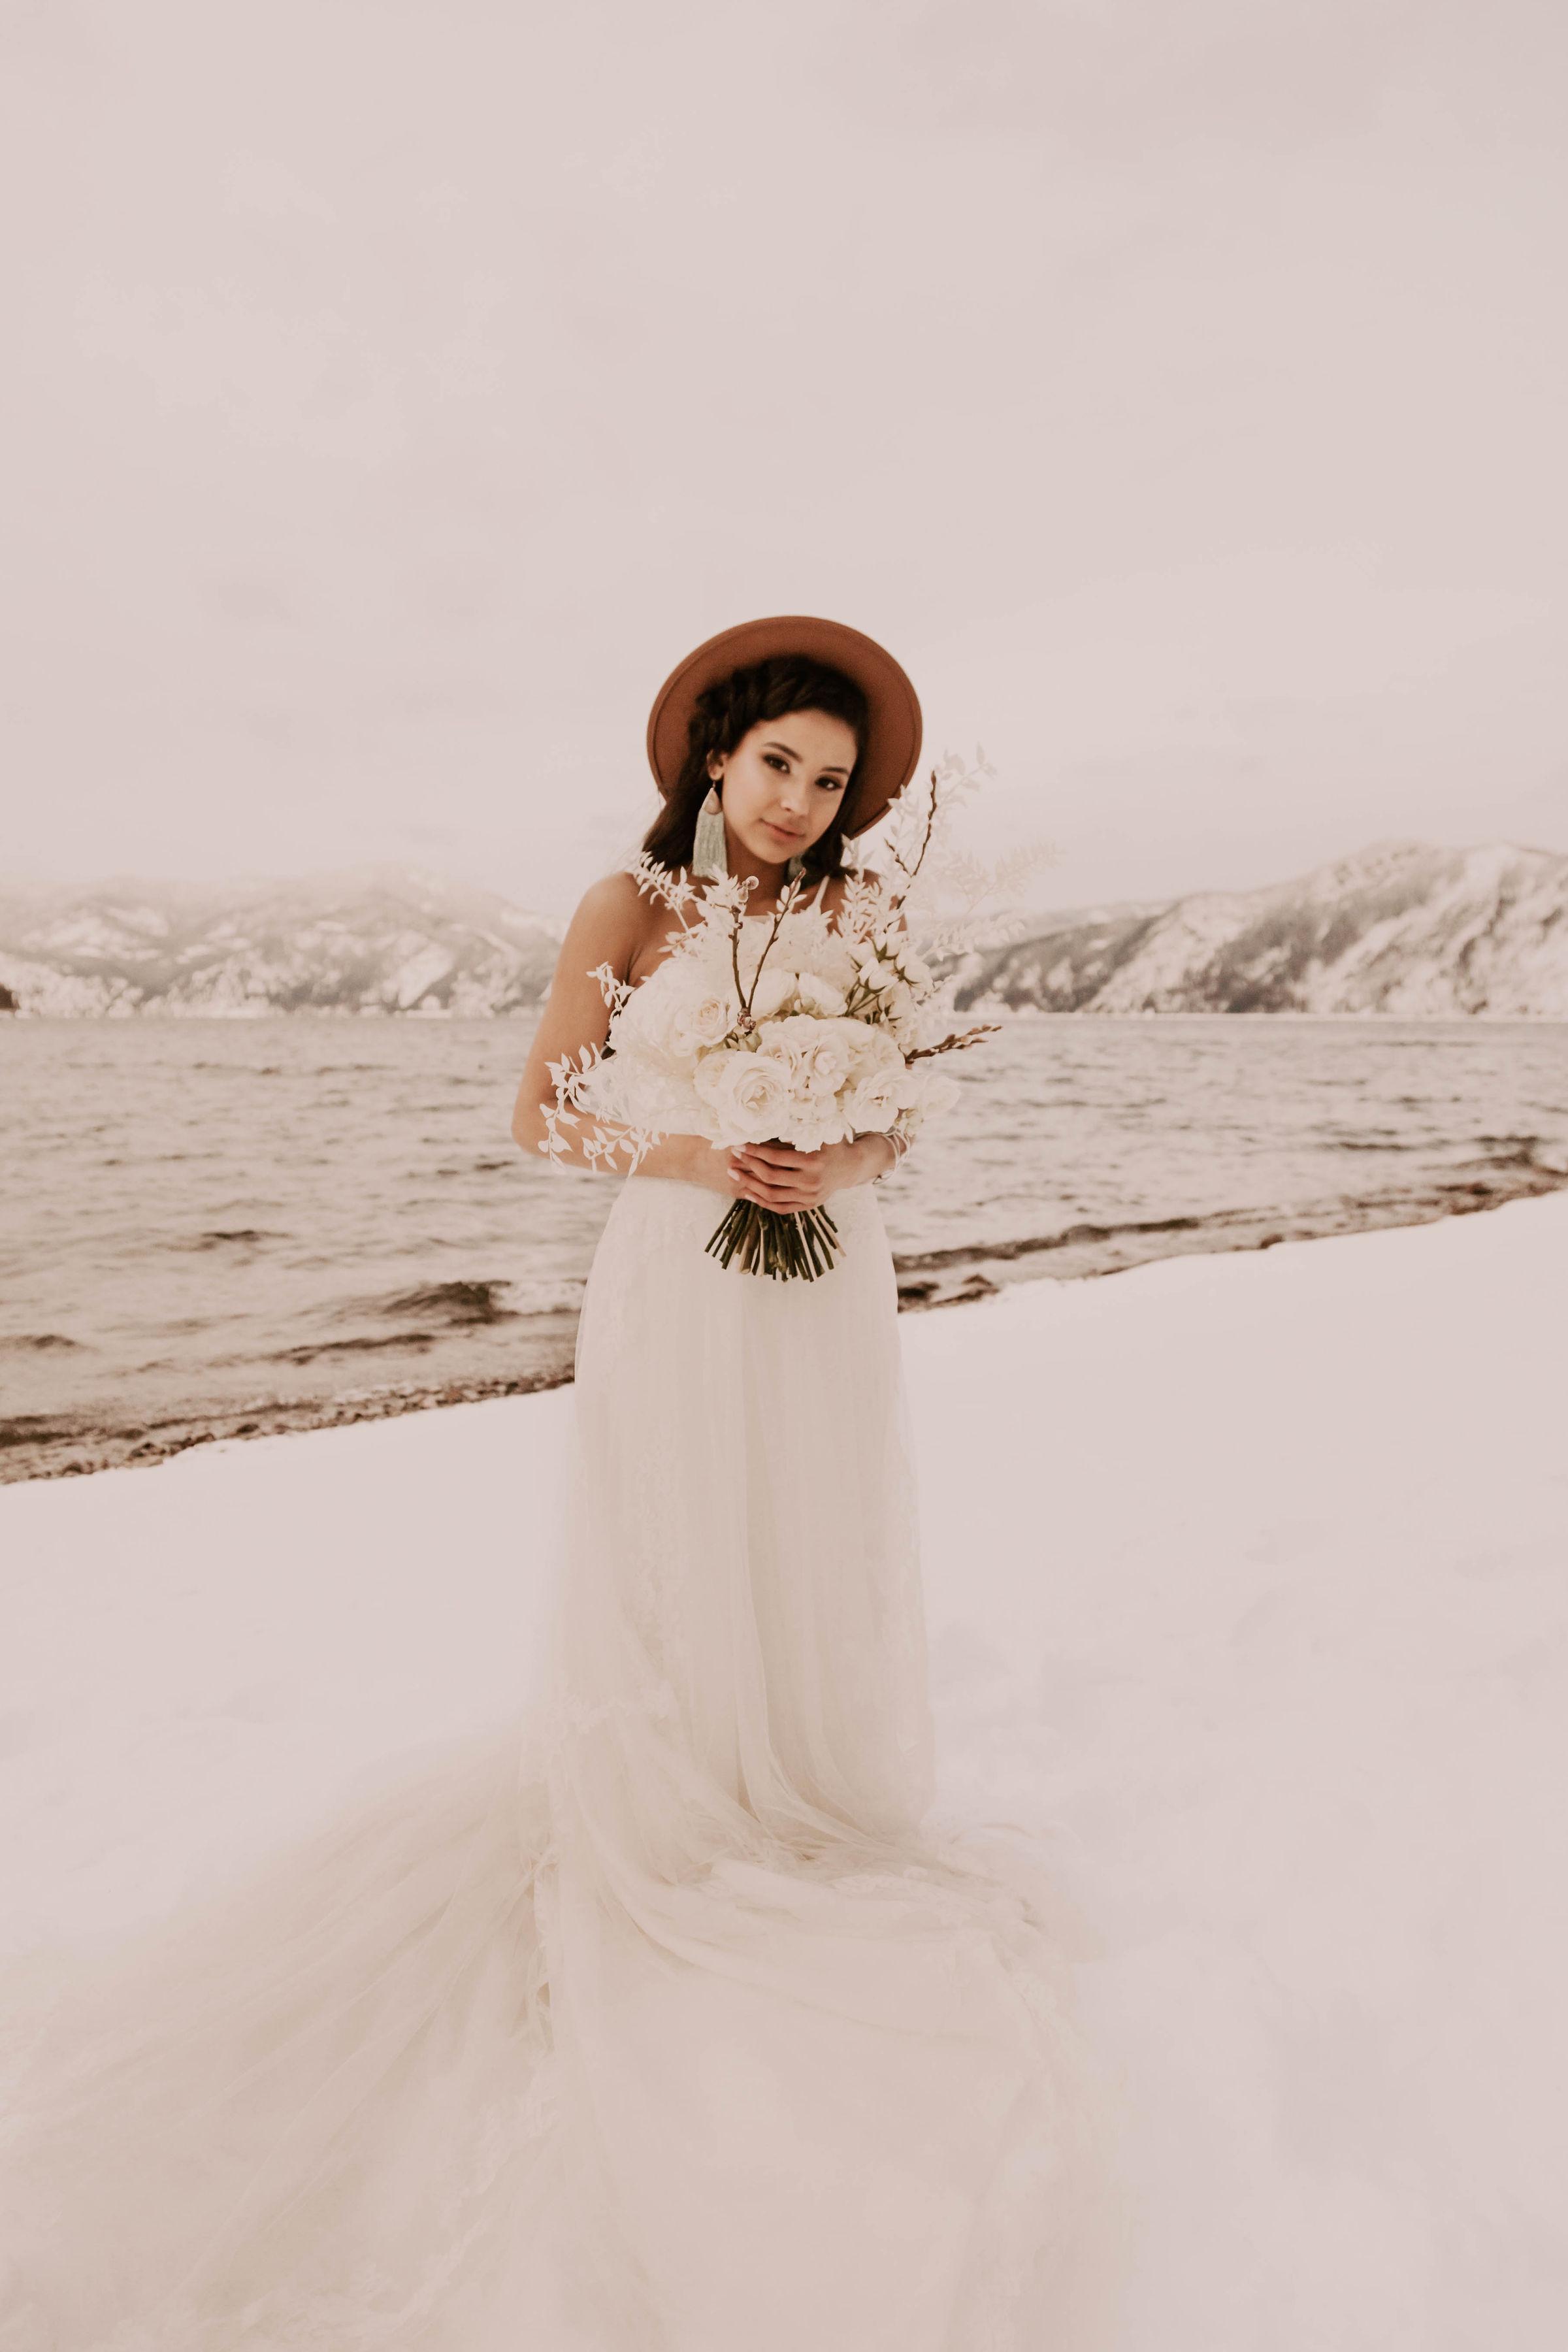 winter wedding bride spokane florals and brown hat